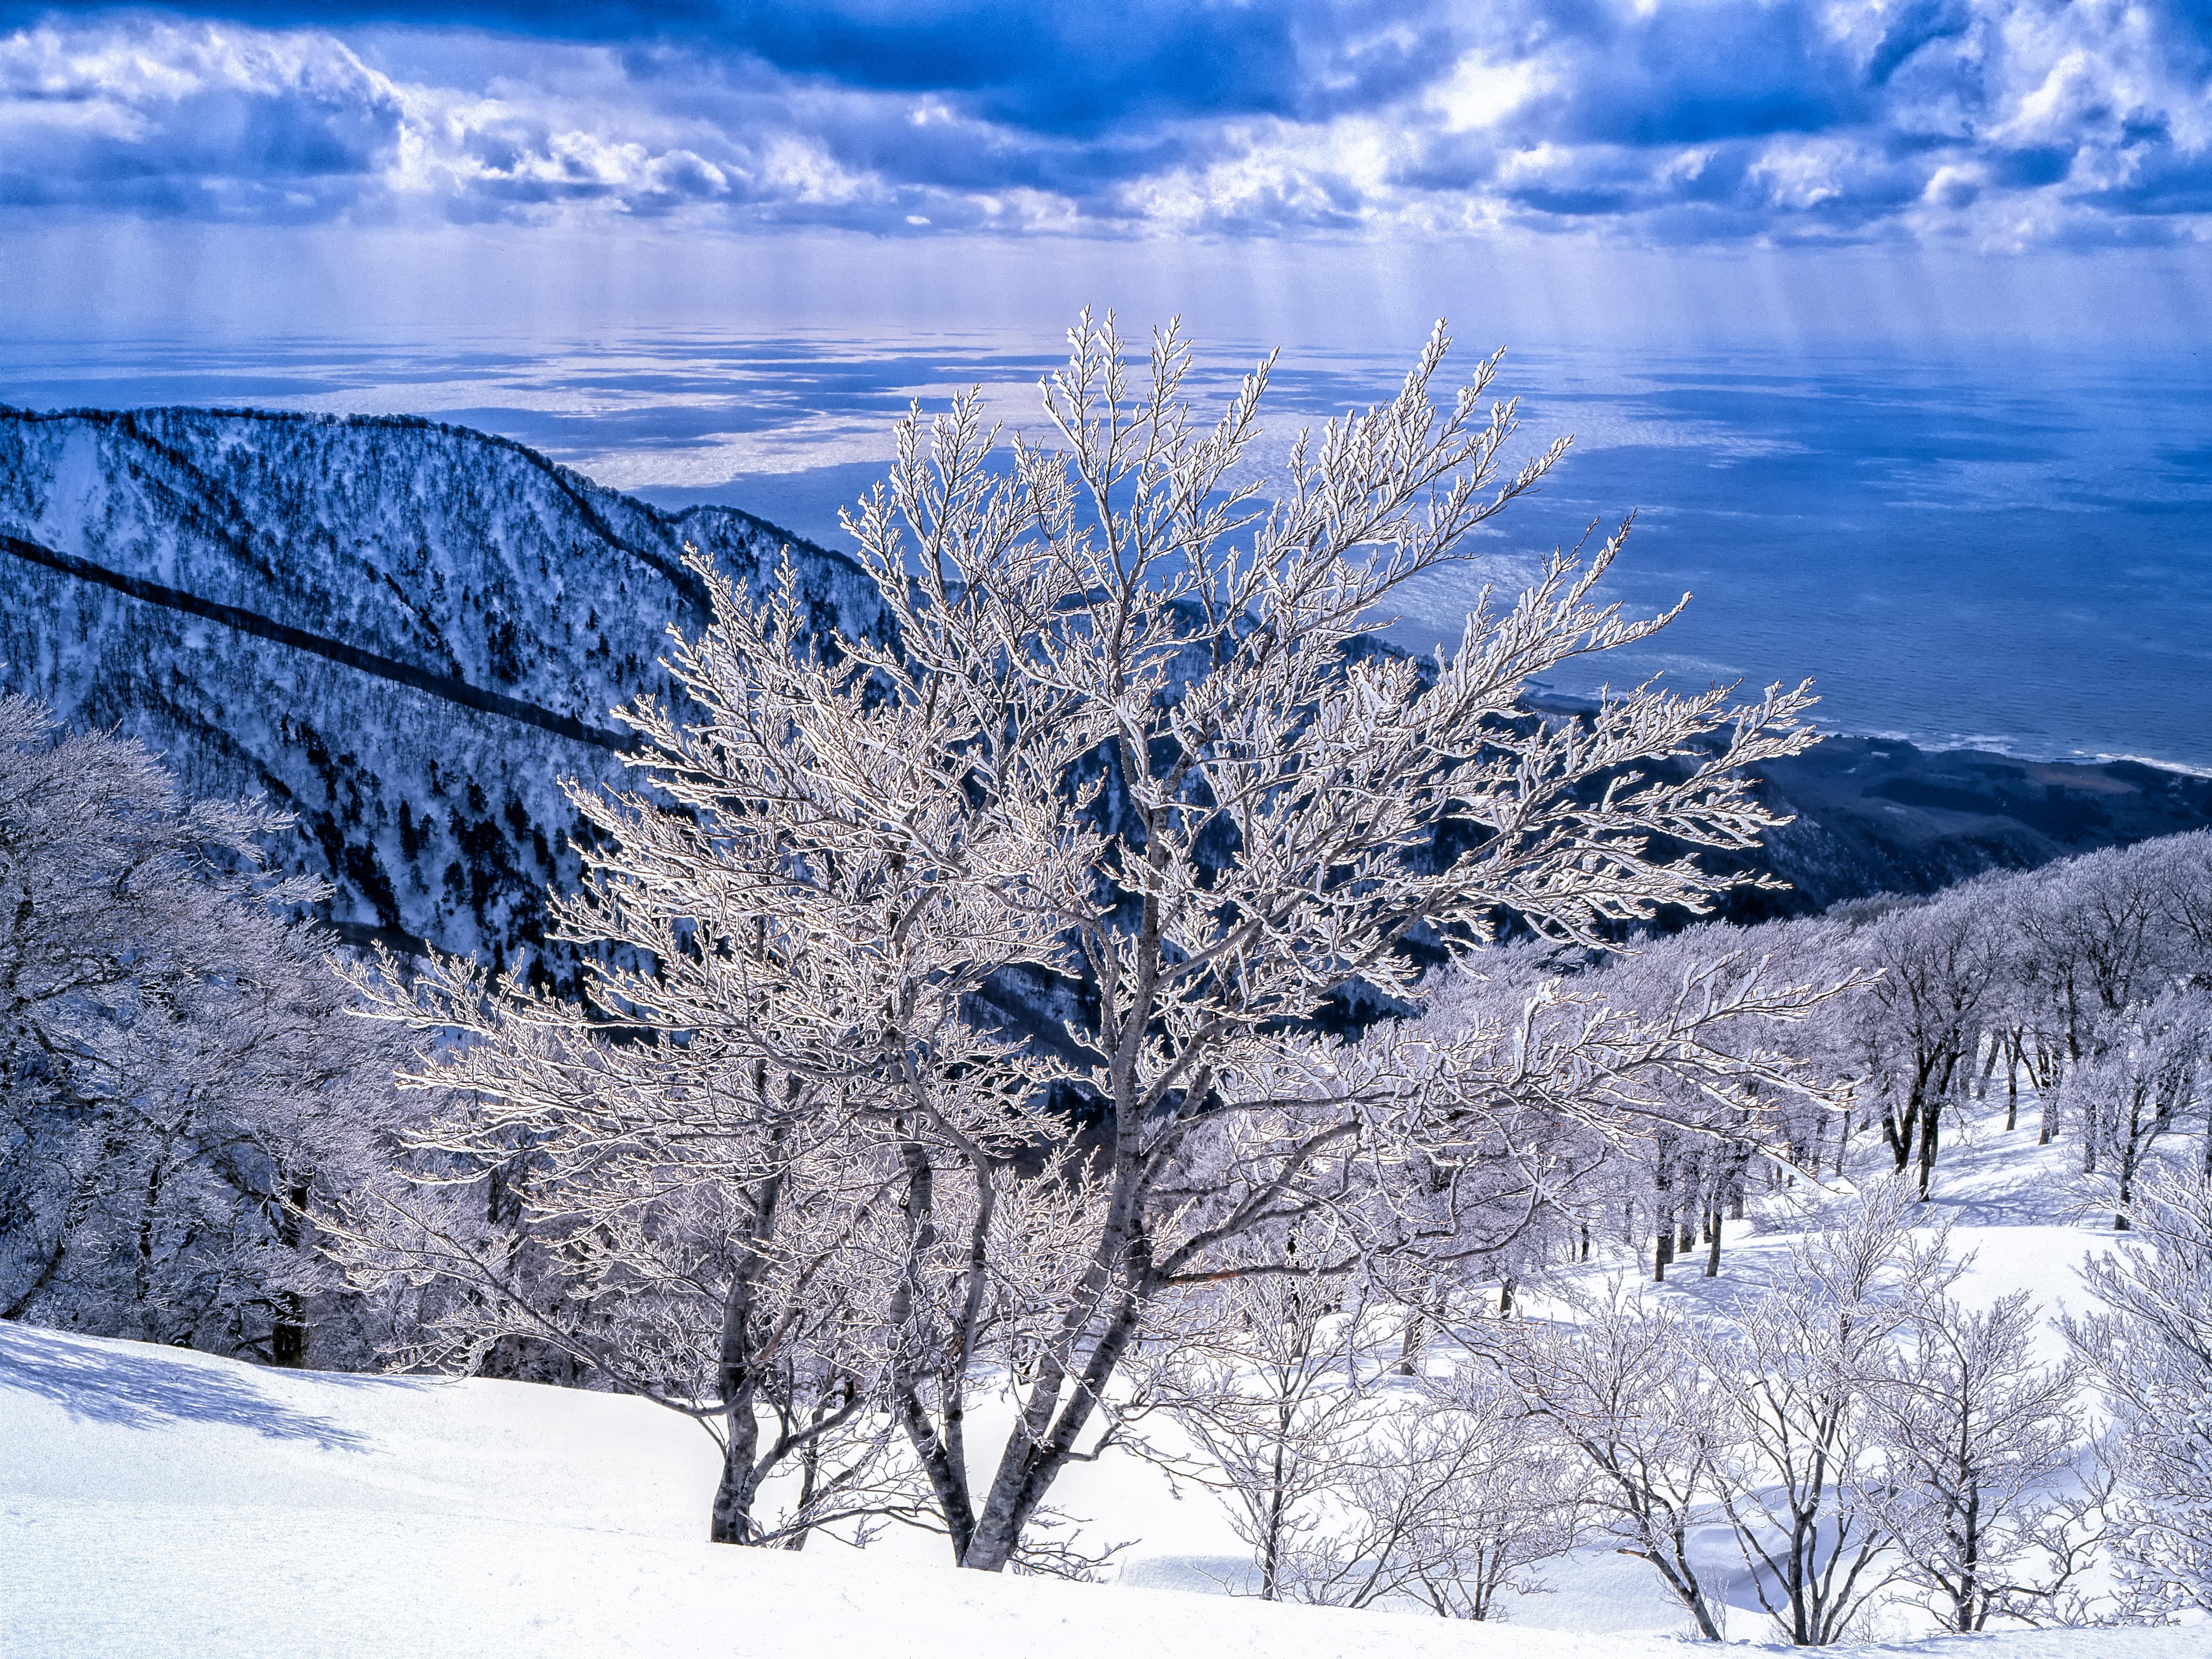 snow winter seasons sea - photo #28